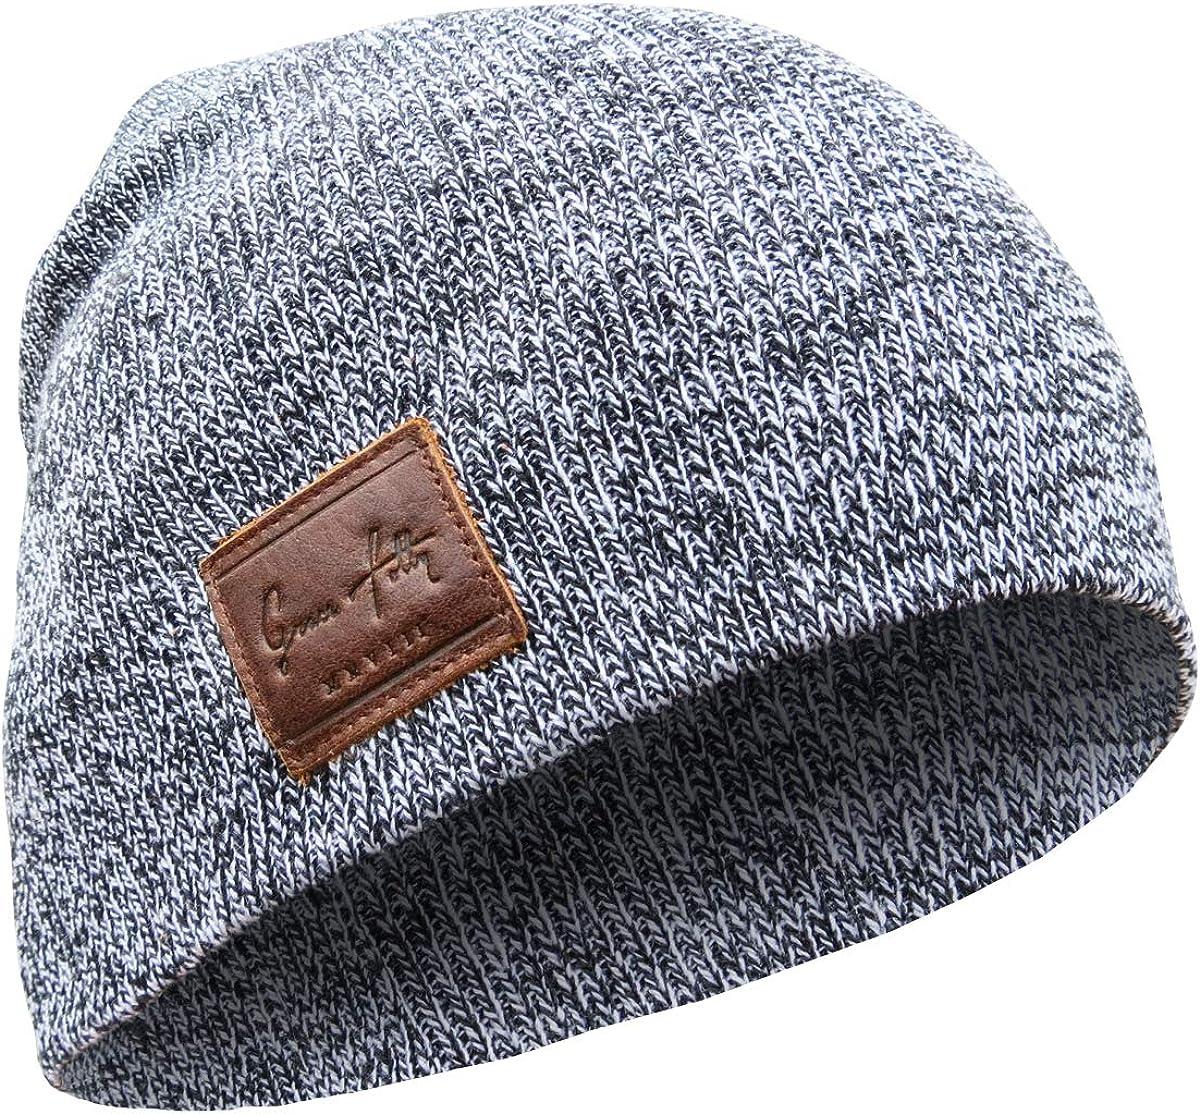 Grace Folly Knit Beanie Hat or Women Finally resale start Cap for Men Online limited product